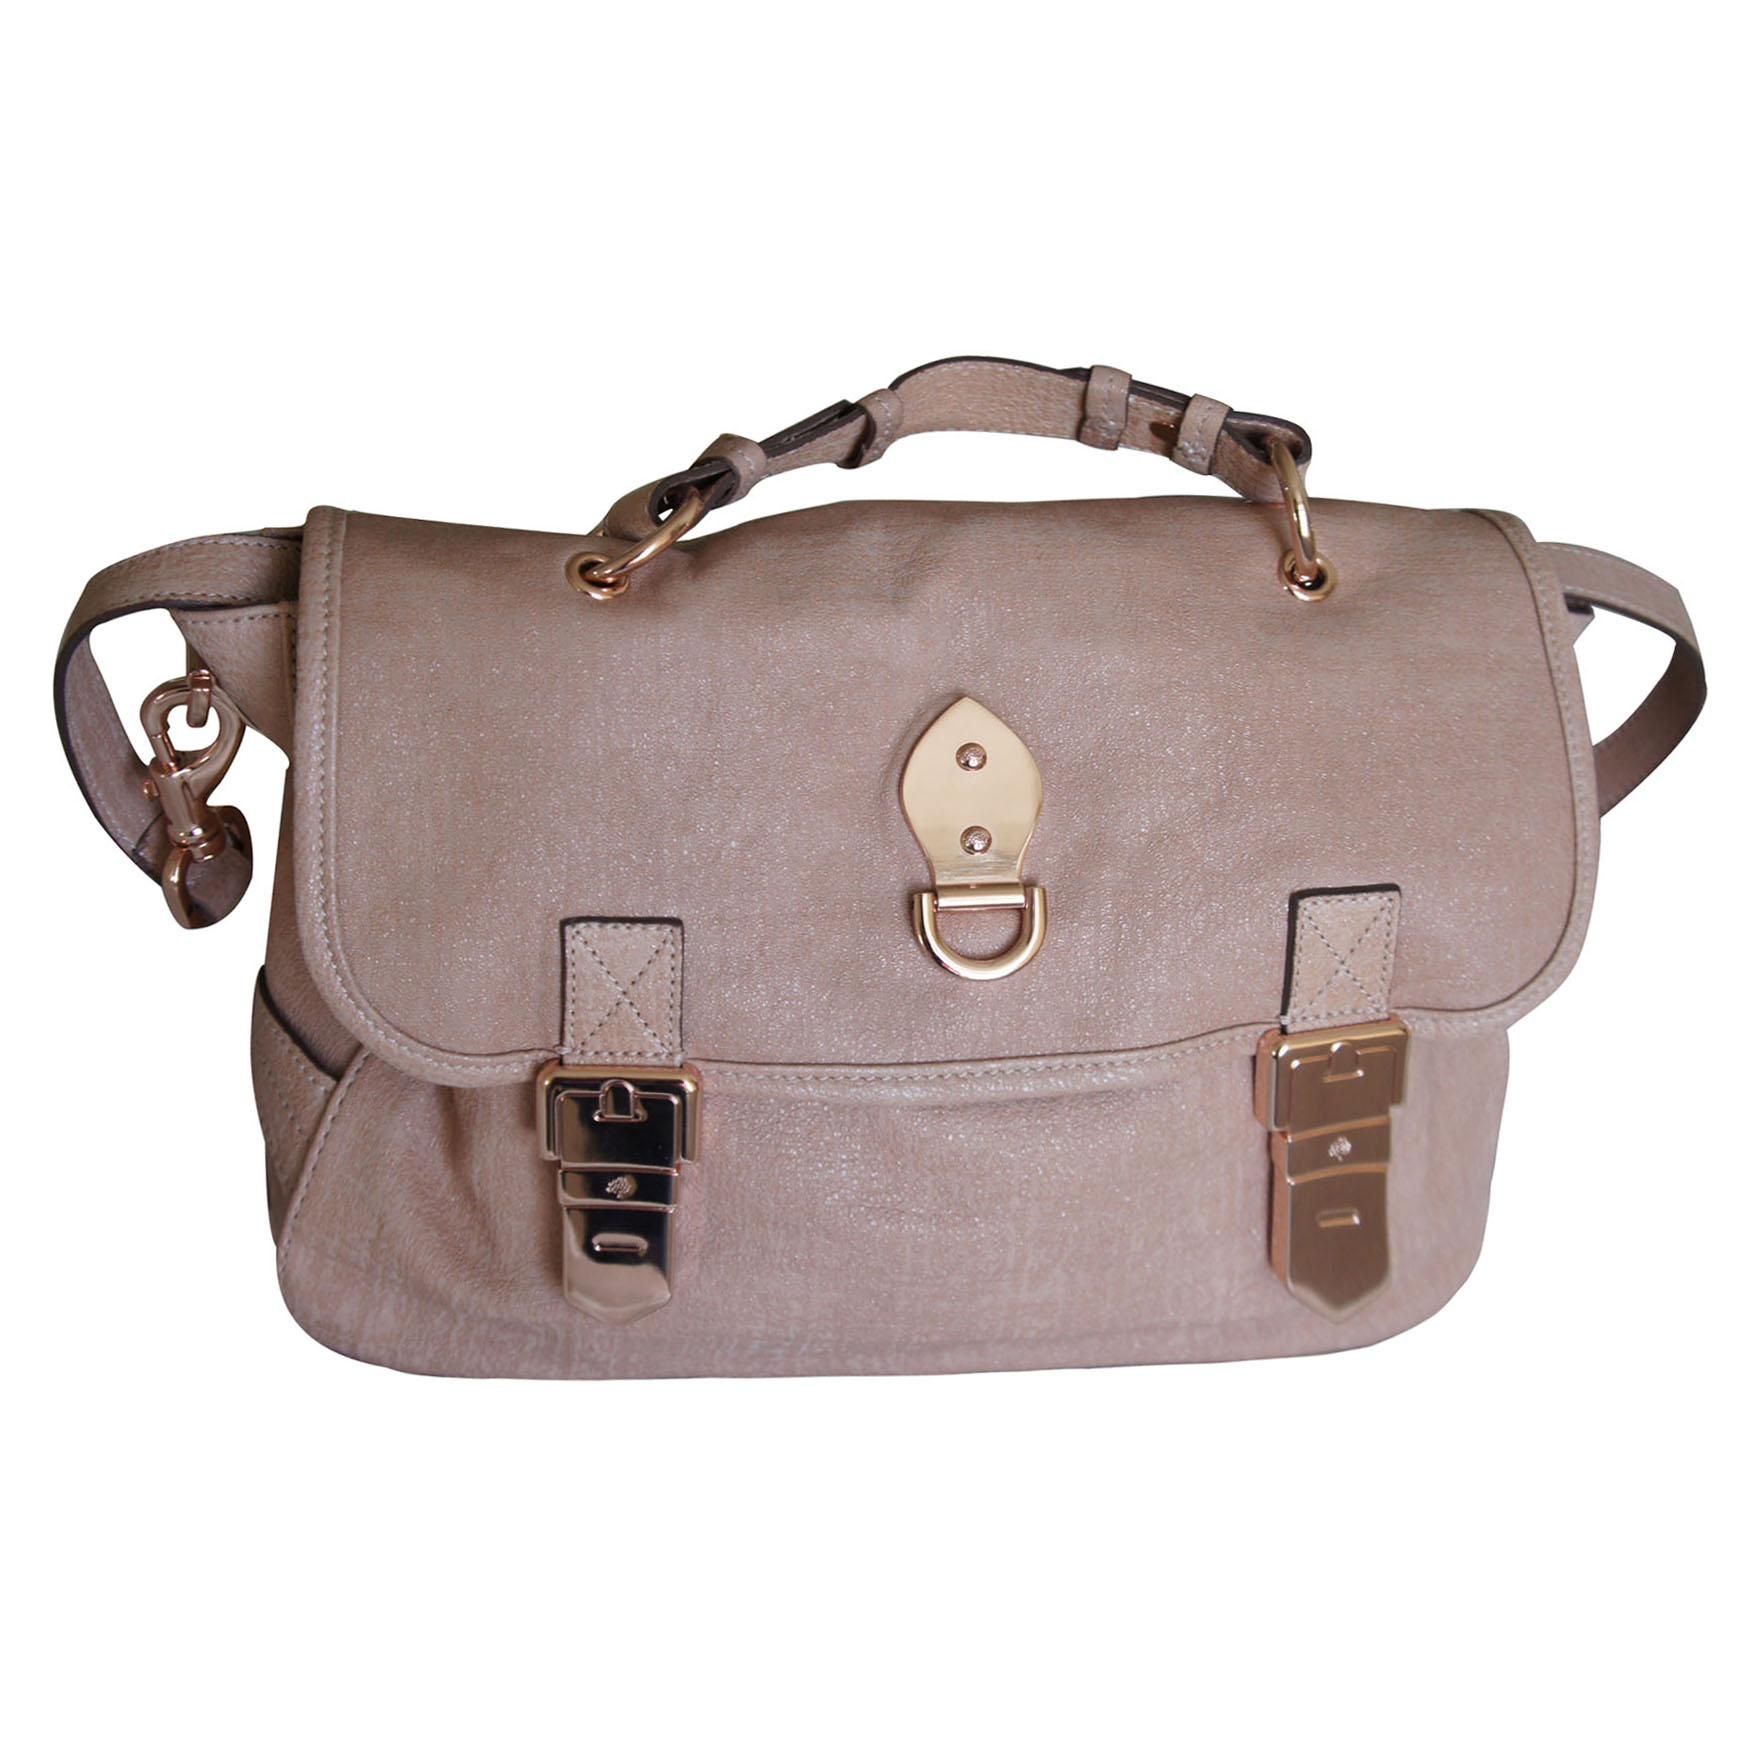 Mulberry Tillie Satchel Bag Powder Beige Sparkle Tweed (Pink) Leather a3c40aa3d2d20